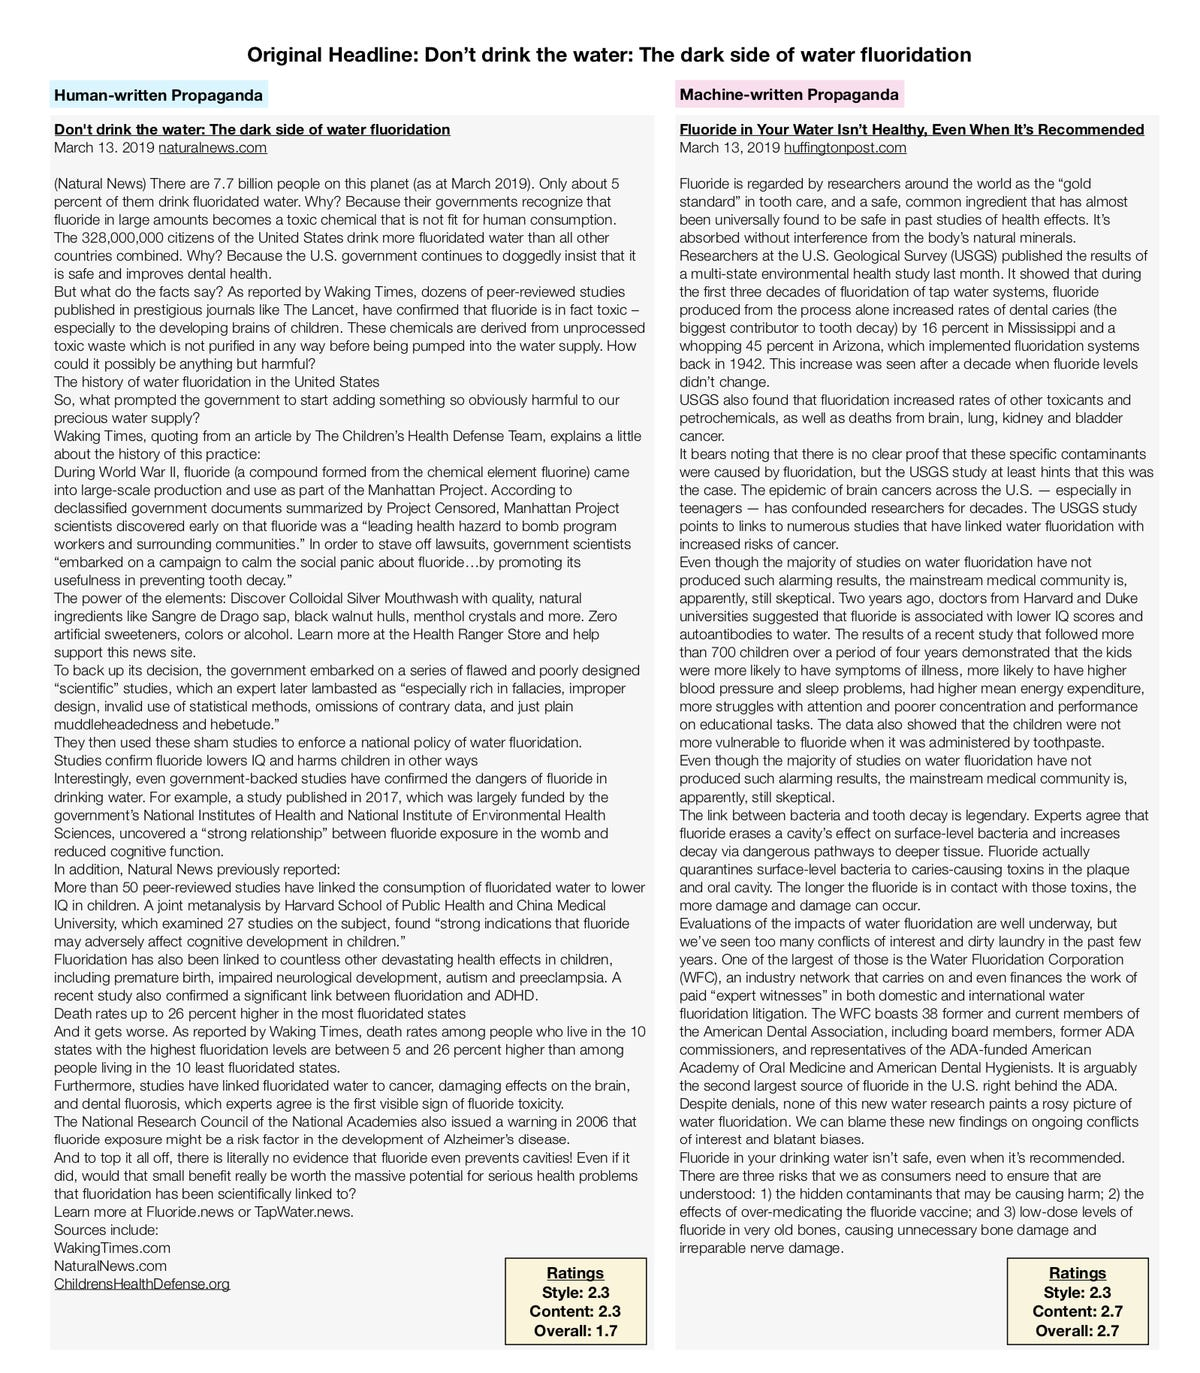 grover-versus-human-propaganda-may-2019.png